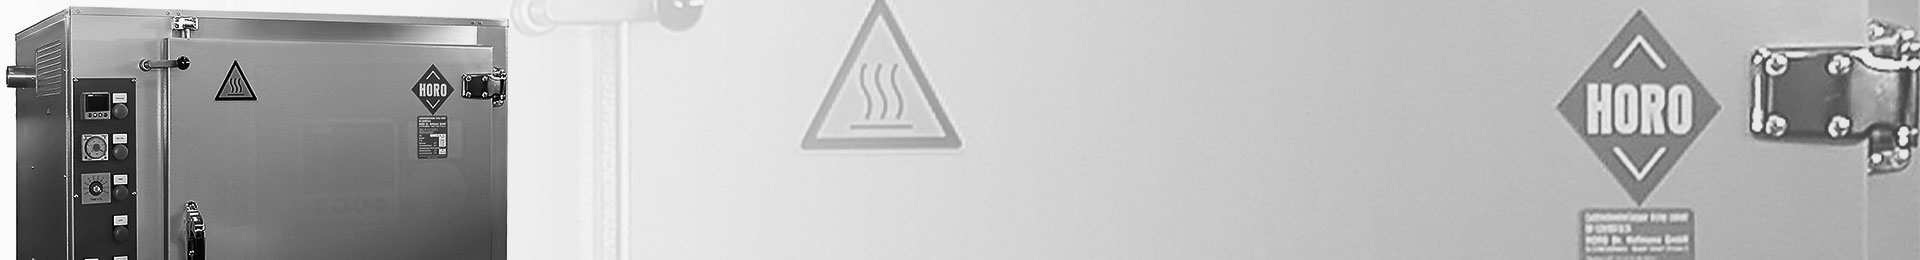 The alternative to the Bunsen burner: The laboratory electric burner from HORO._Headerbild